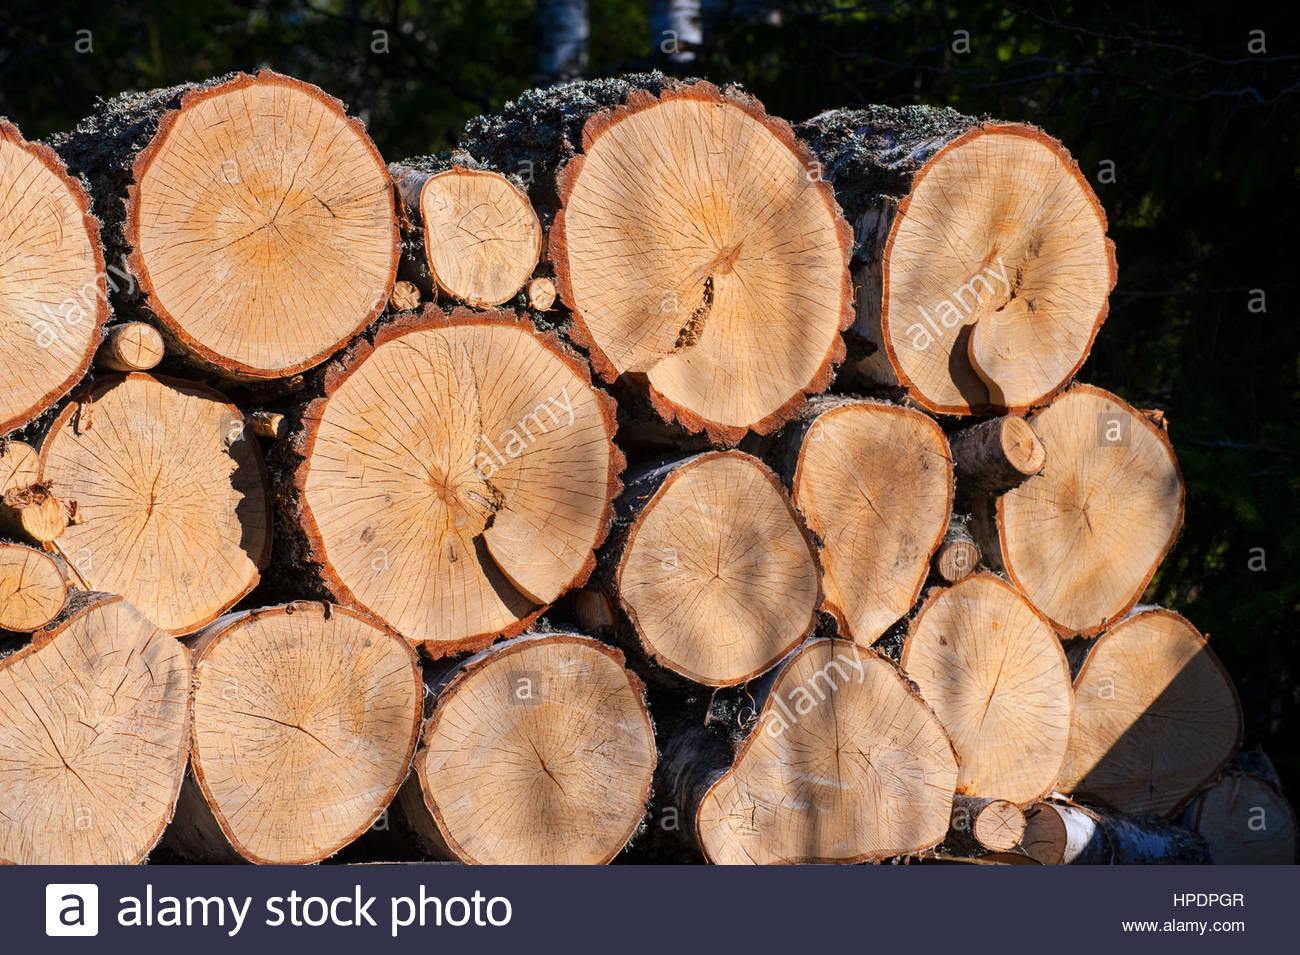 wood logs switzerland stockfotos wood logs switzerland bilder alamy. Black Bedroom Furniture Sets. Home Design Ideas